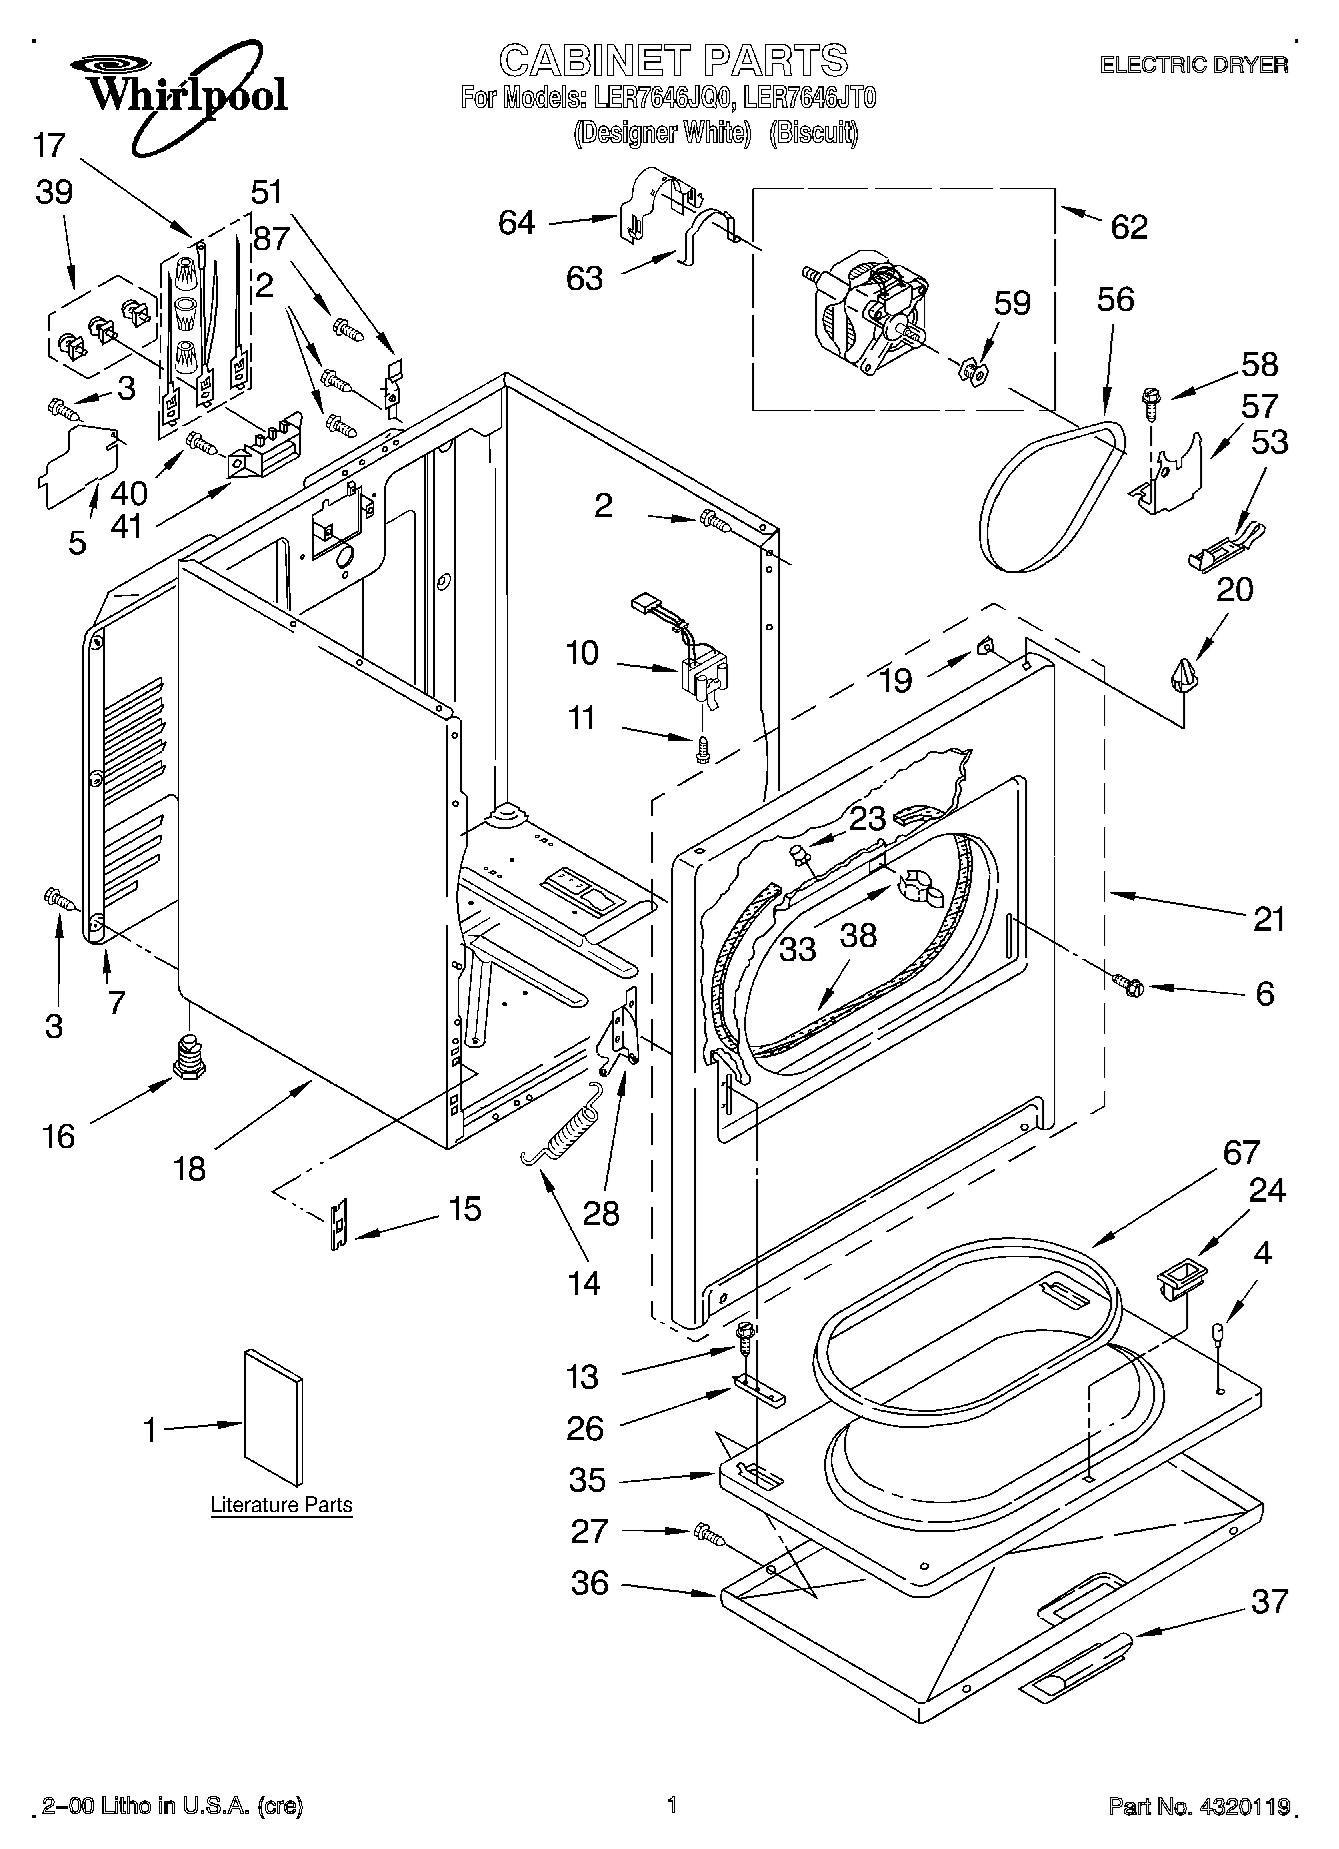 whirlpool defrost control board wiring whirlpool